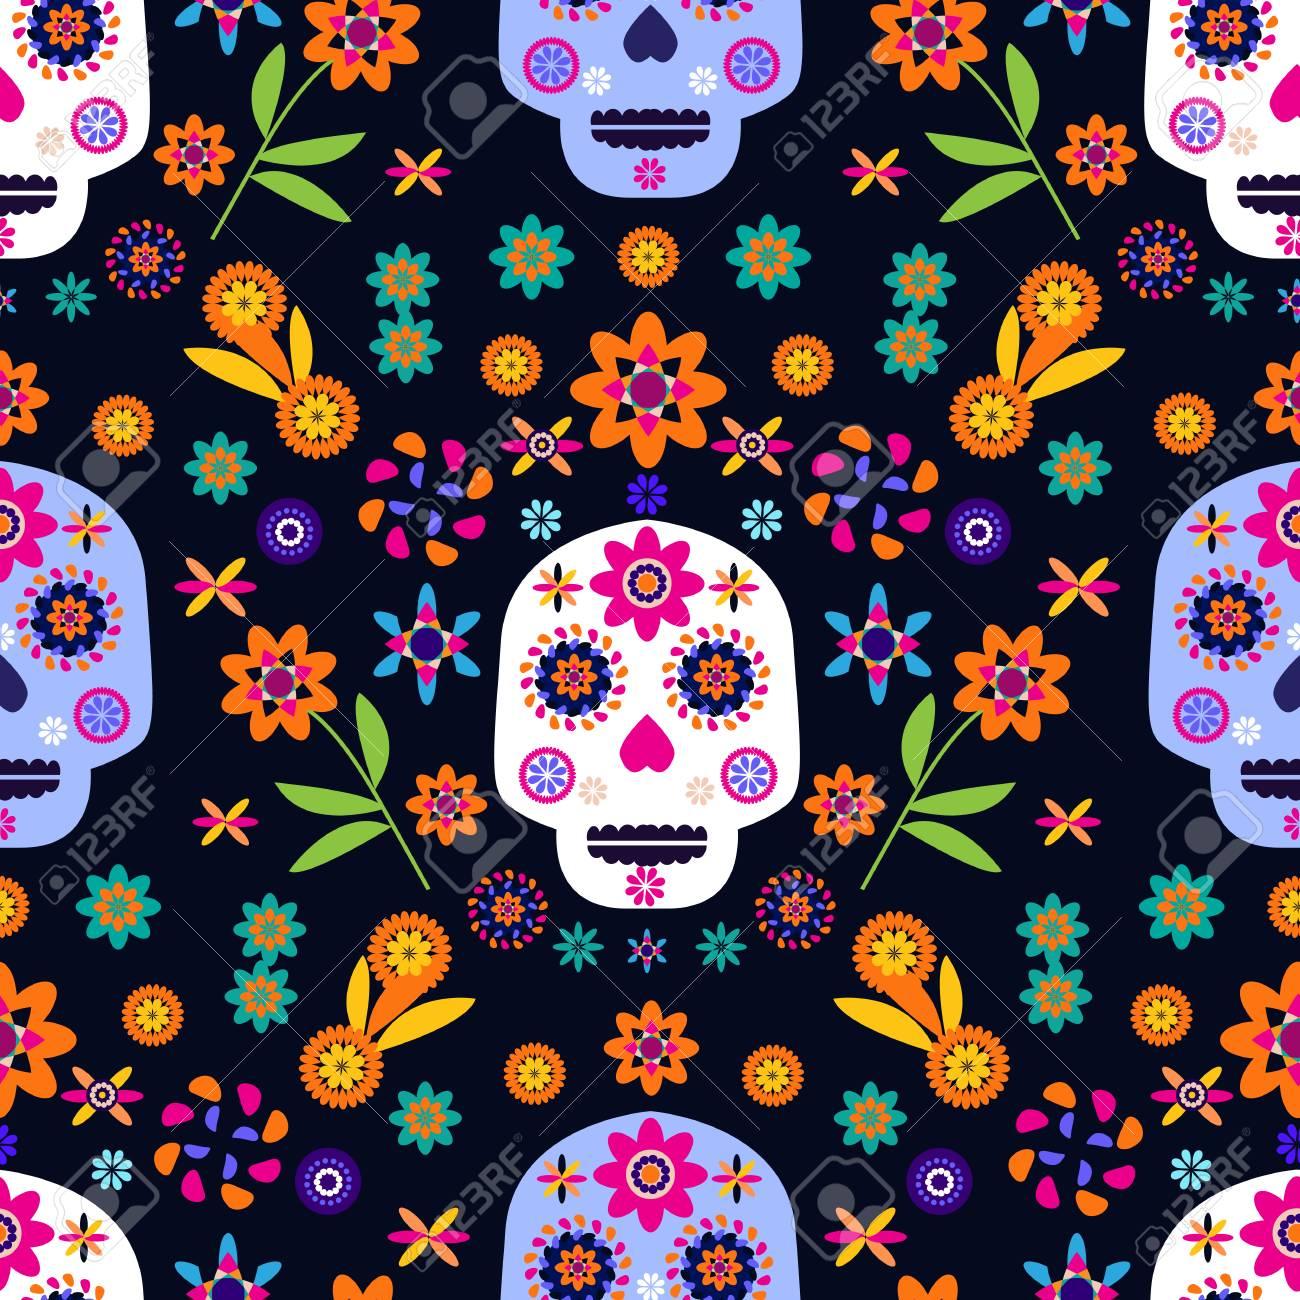 HOOSUNFlagrbfa Sugar Abstract Floral Mexican Sugar Skulls Day of The Dead Flowers Custom Folding Hanger Holder Table Hook for Purse Handbag Handbag Hanger Purse Hooks